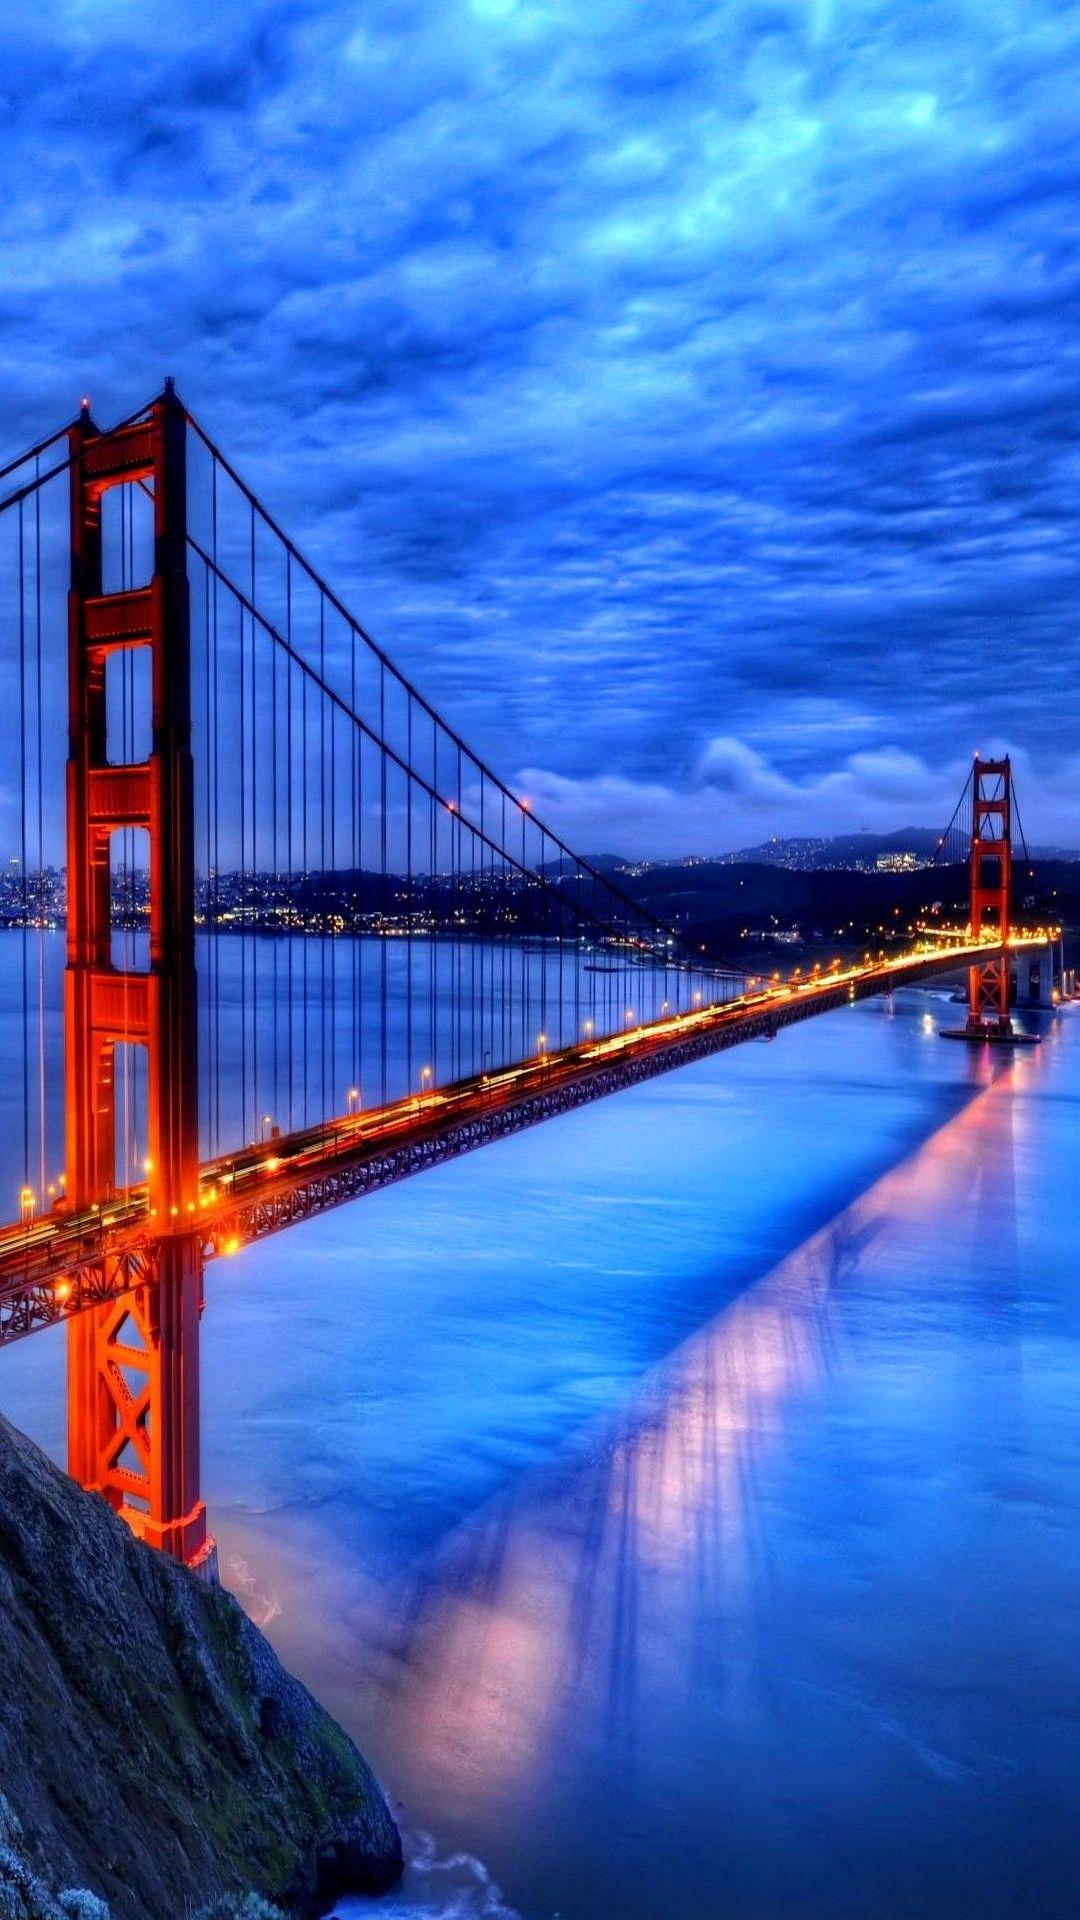 Golden Gate Bridge Wallpaper Golden Gate Bridge Wallpaper Bridge Wallpaper San Francisco Golden Gate Bridge